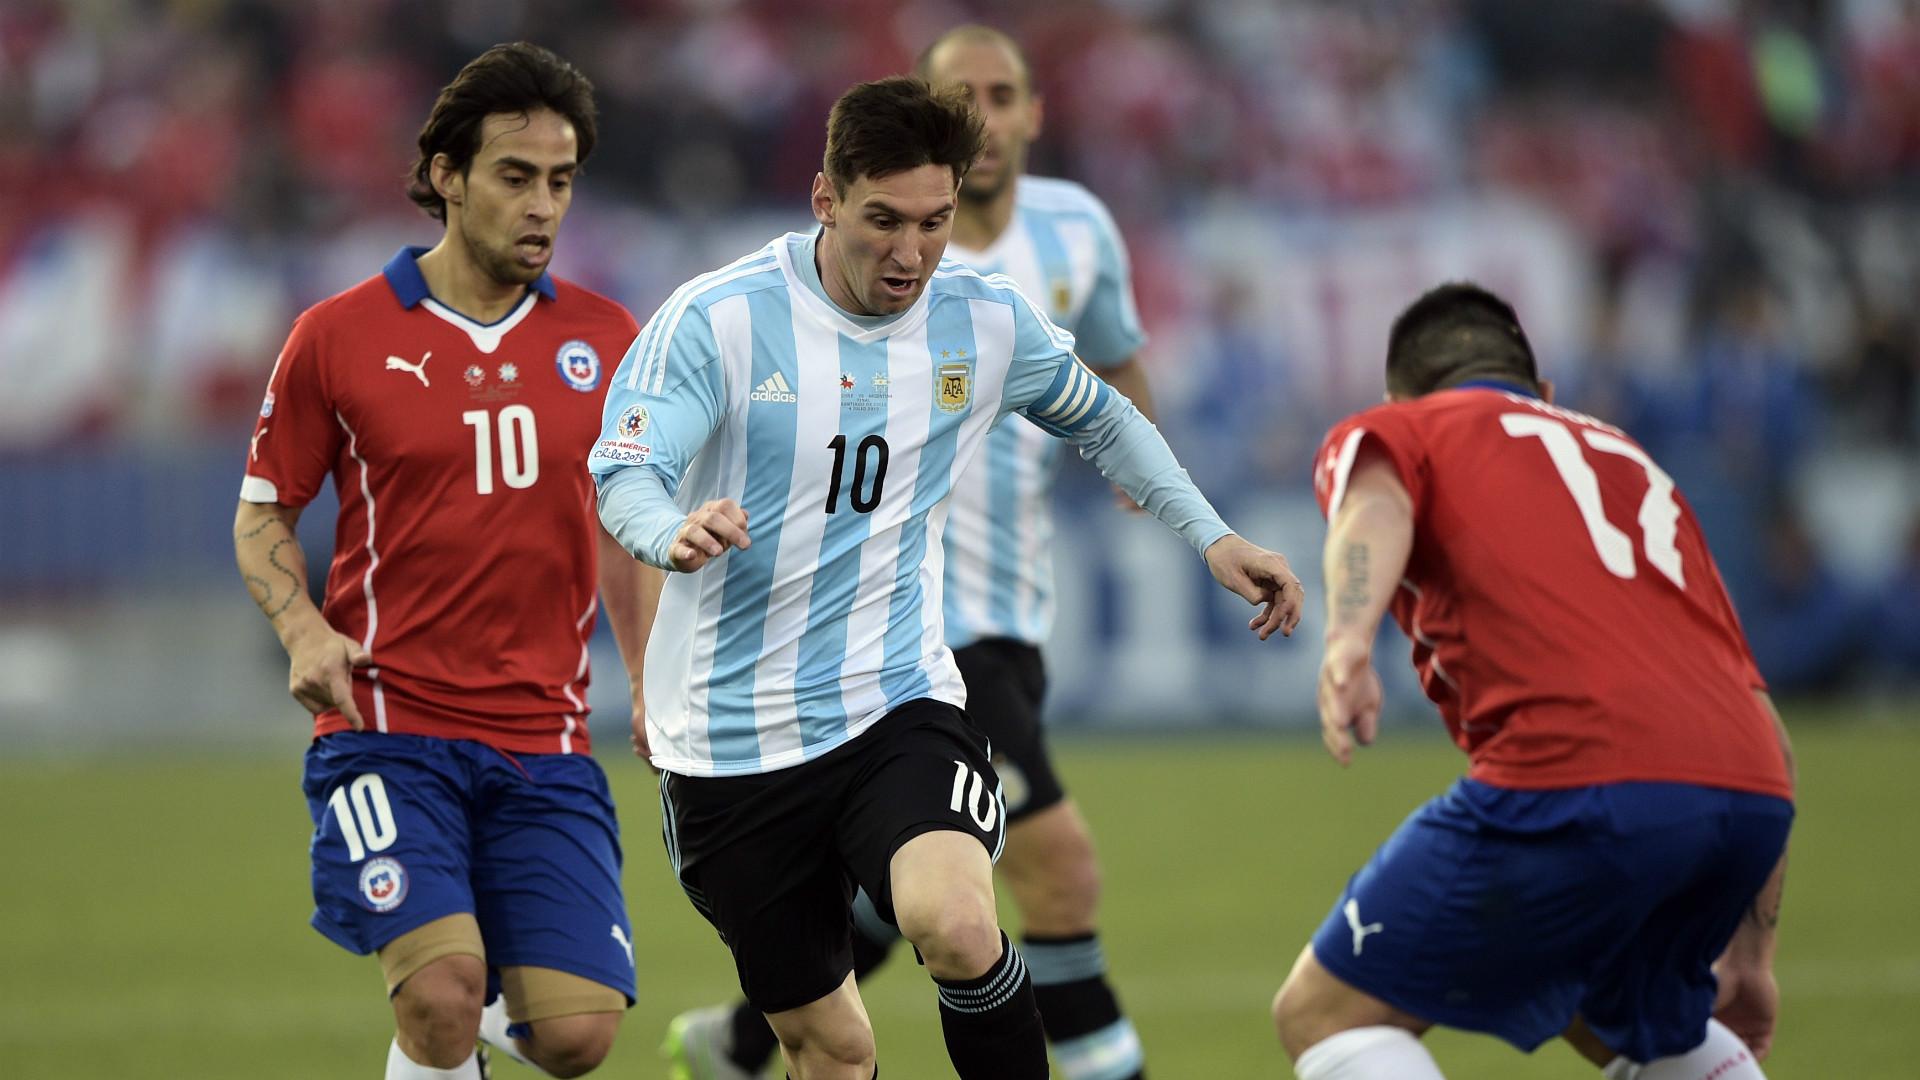 Lionel Messi Argentina Chile Final Copa América 2015